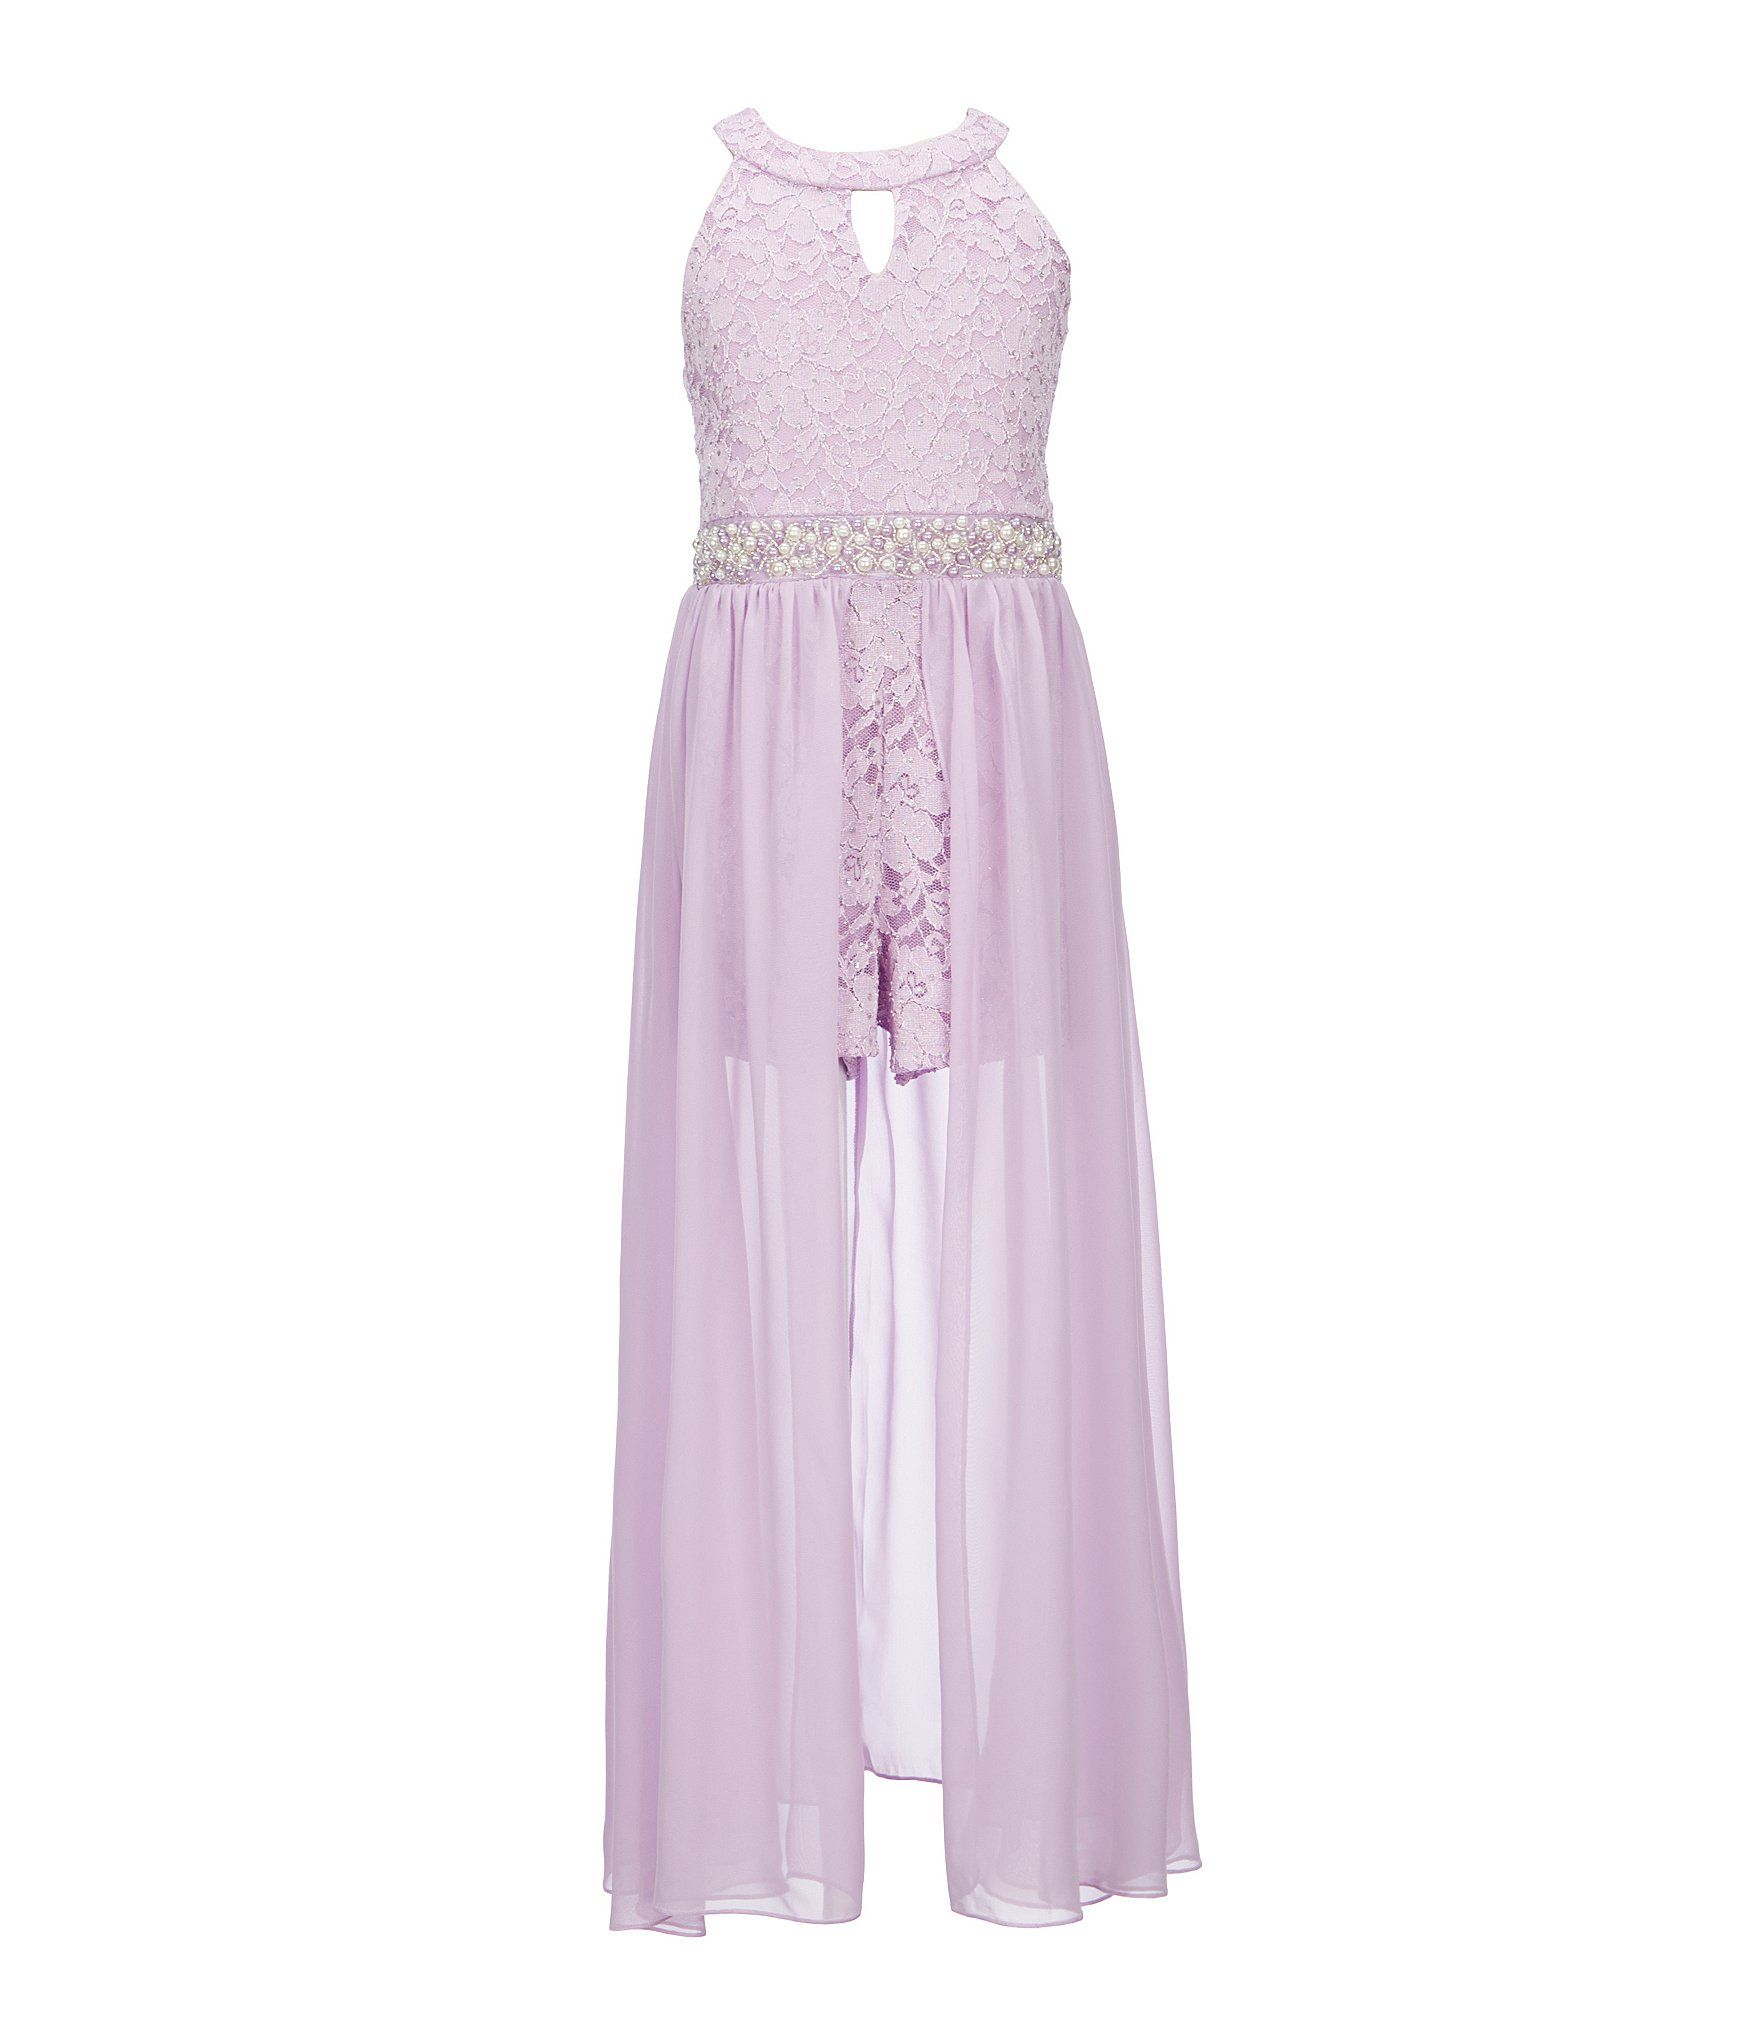 92c2a1b0f775 Shop for Xtraordinary Big Girls 7-16 Lace Chiffon Maxi Romper at Dillards. com. Visit Dillards.com to find clothing